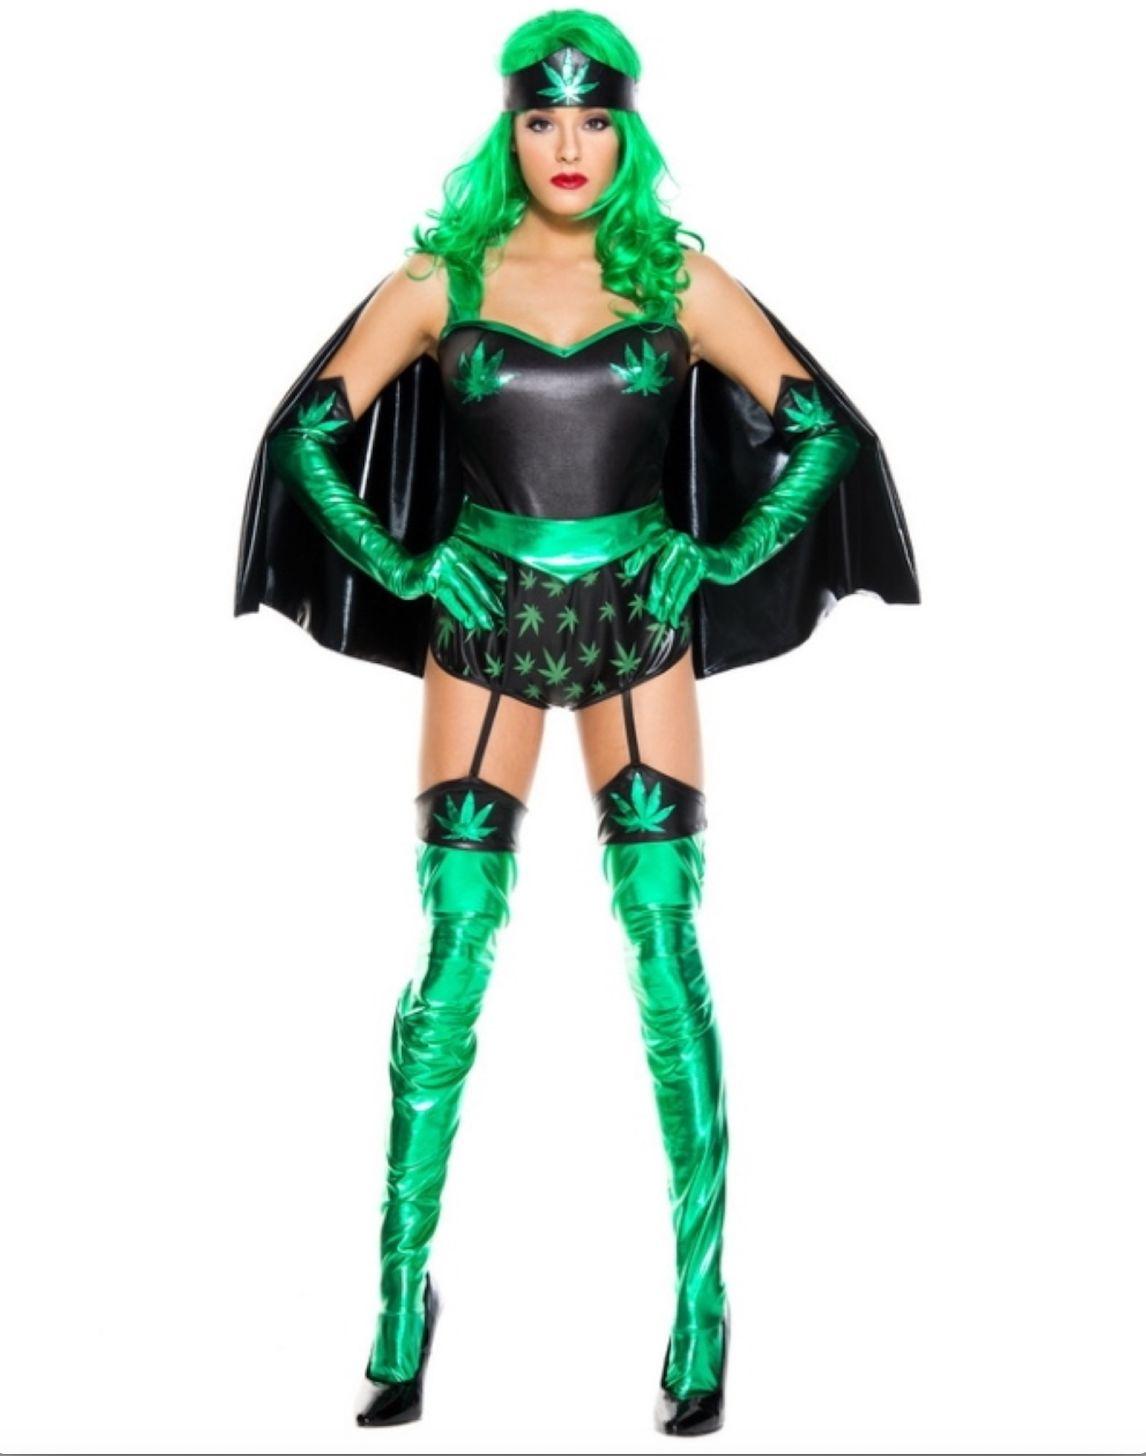 "No, <a href=""https://www.spicylingerie.com/mg-70814.html"" target=""_blank"">""Leafy Super Woman"" </a>is one heroine who isn't in"